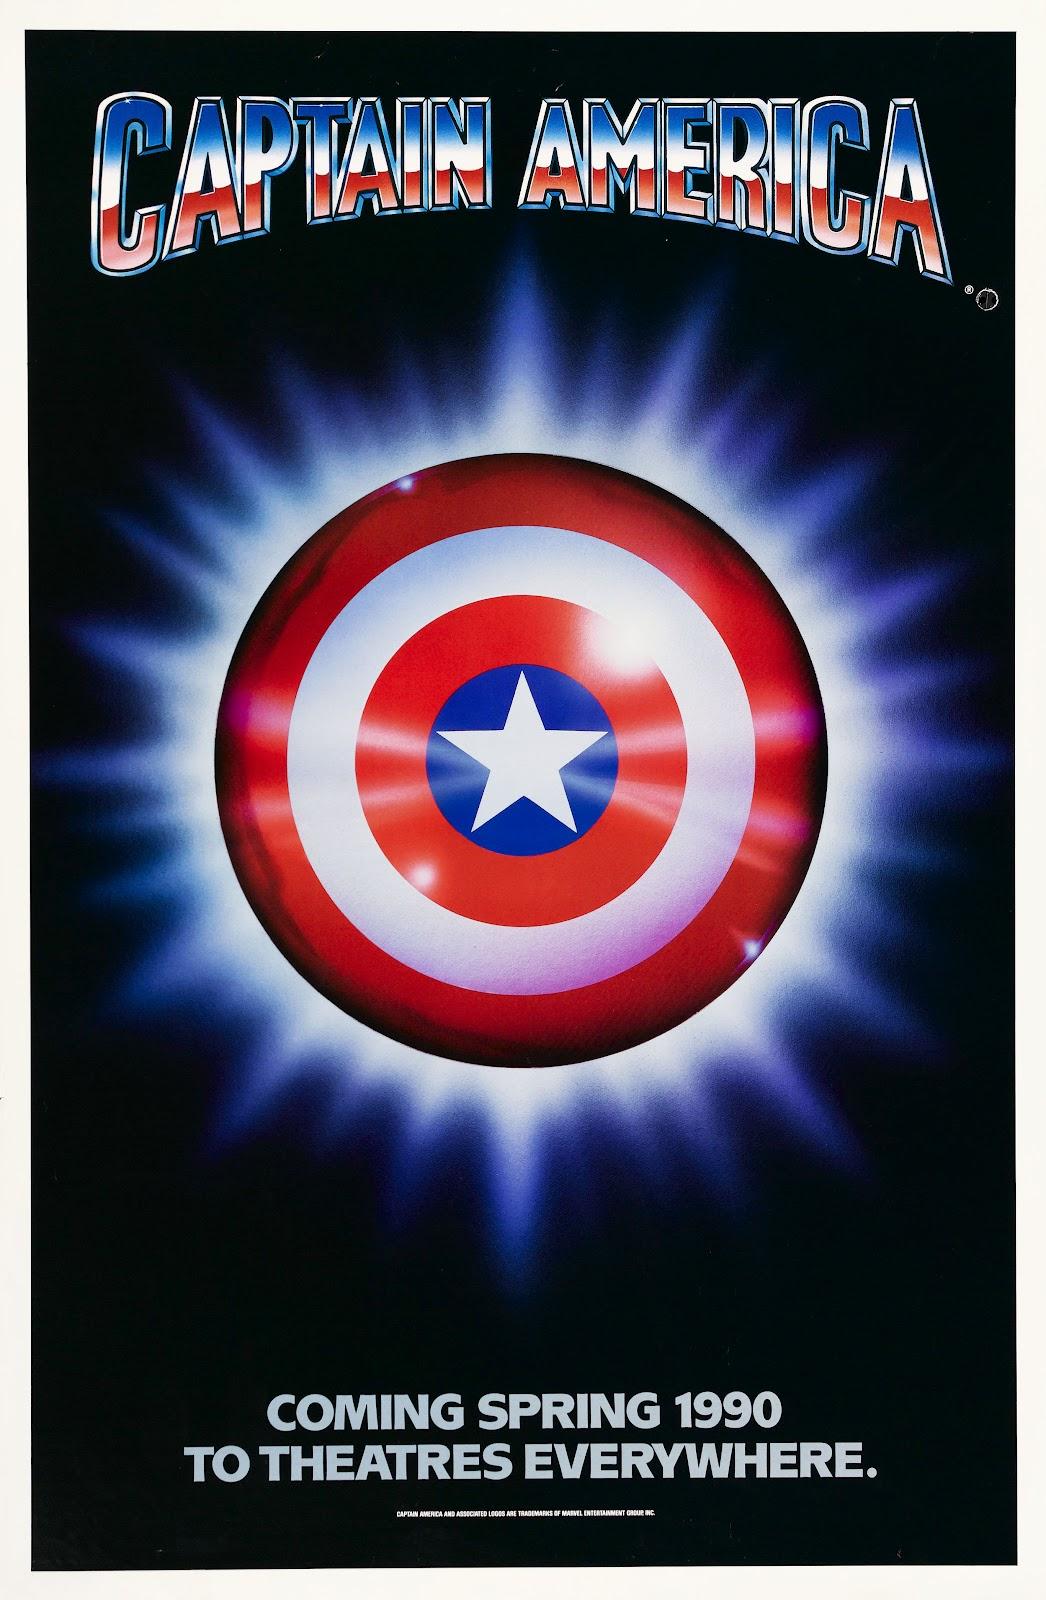 http://4.bp.blogspot.com/-fpZQGOS5HTU/UDDMiQBHO6I/AAAAAAAAE70/G0_ZfWy6224/s1600/captain_america_poster_01.jpg